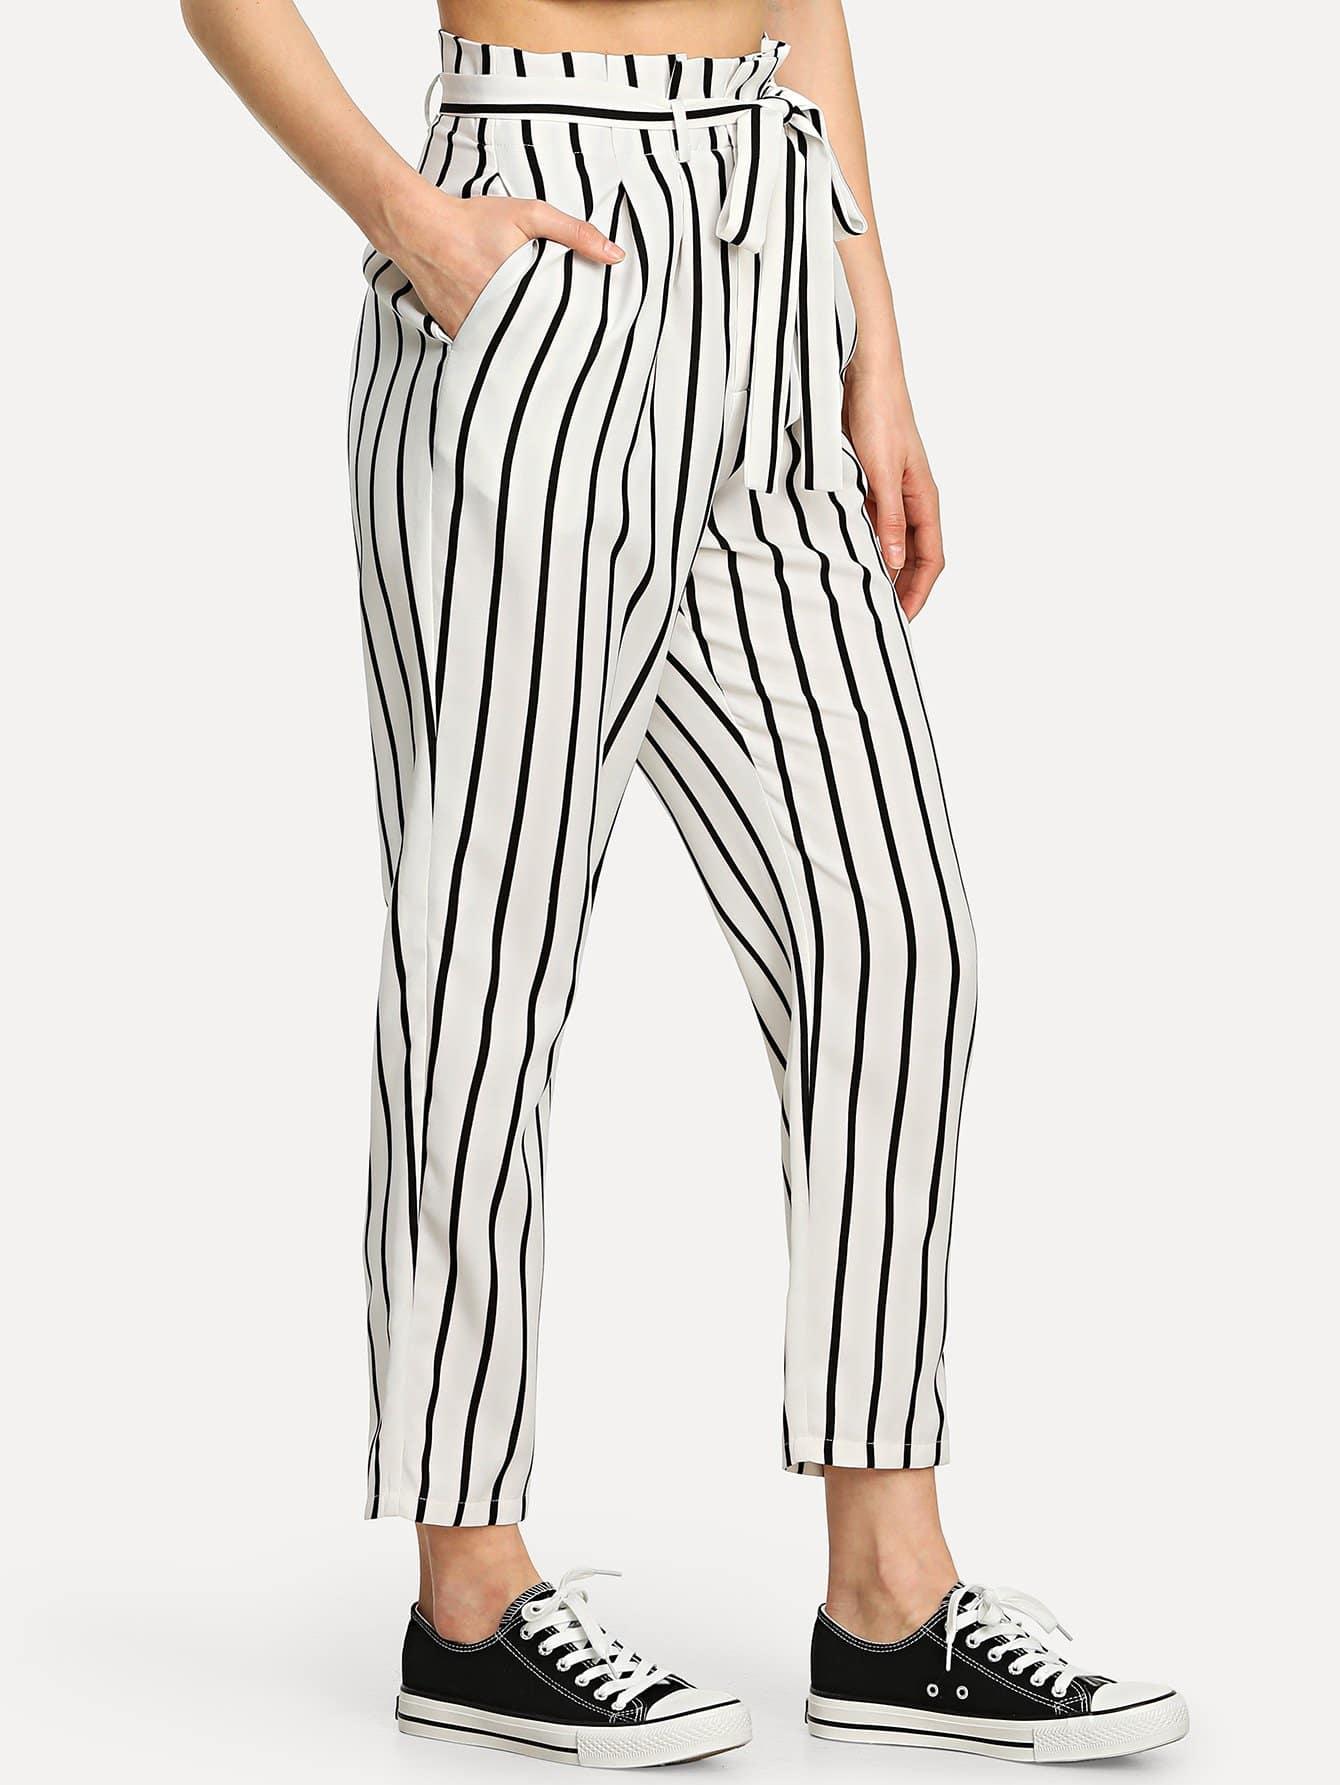 Self Tie Waist Striped Tapered Pants striped ruffled waist self tie pants